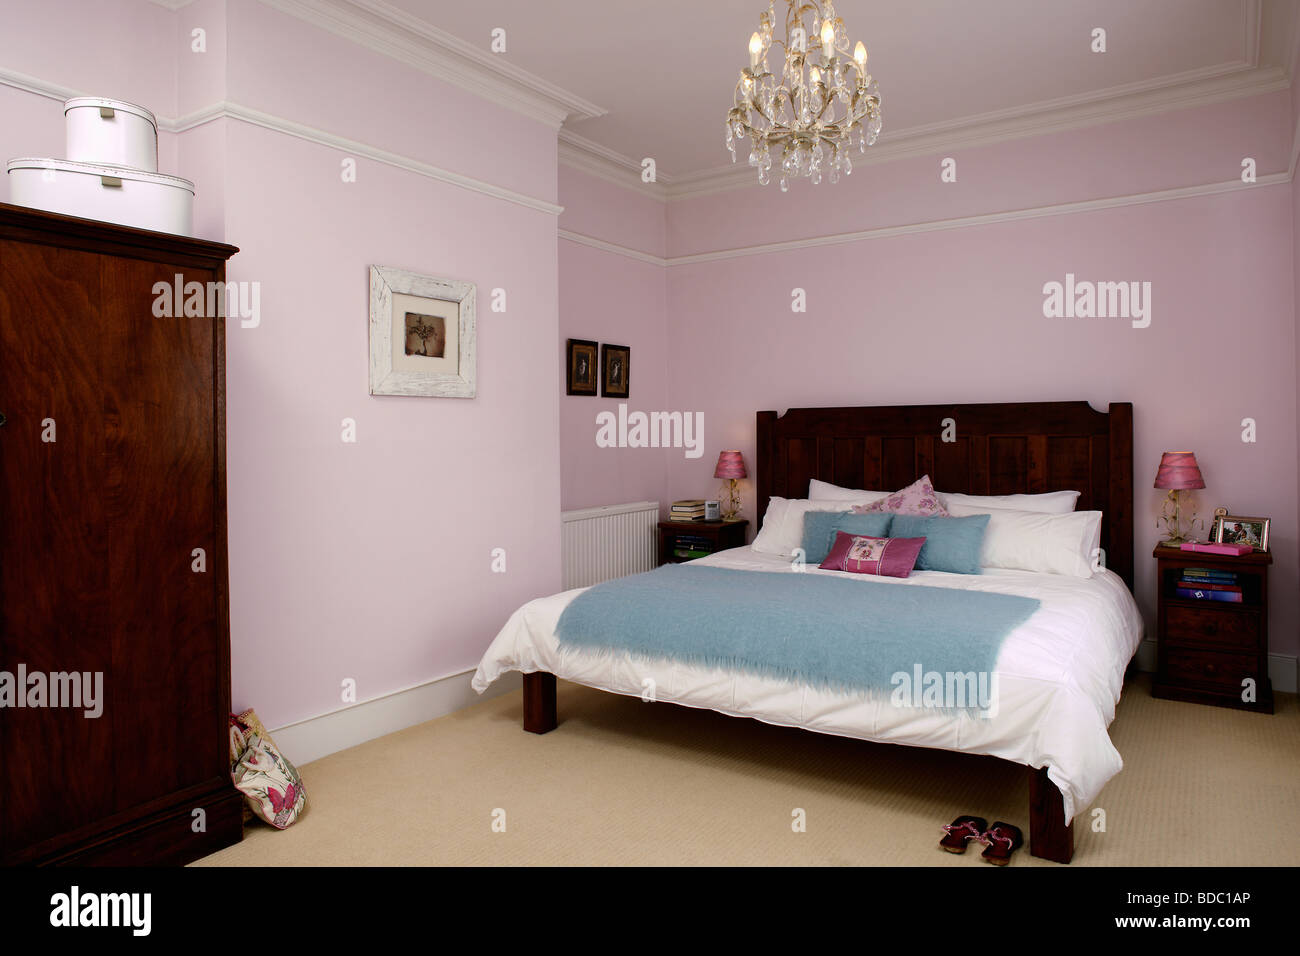 kronleuchter ber dunklen holz bett mit wei er bettw sche. Black Bedroom Furniture Sets. Home Design Ideas